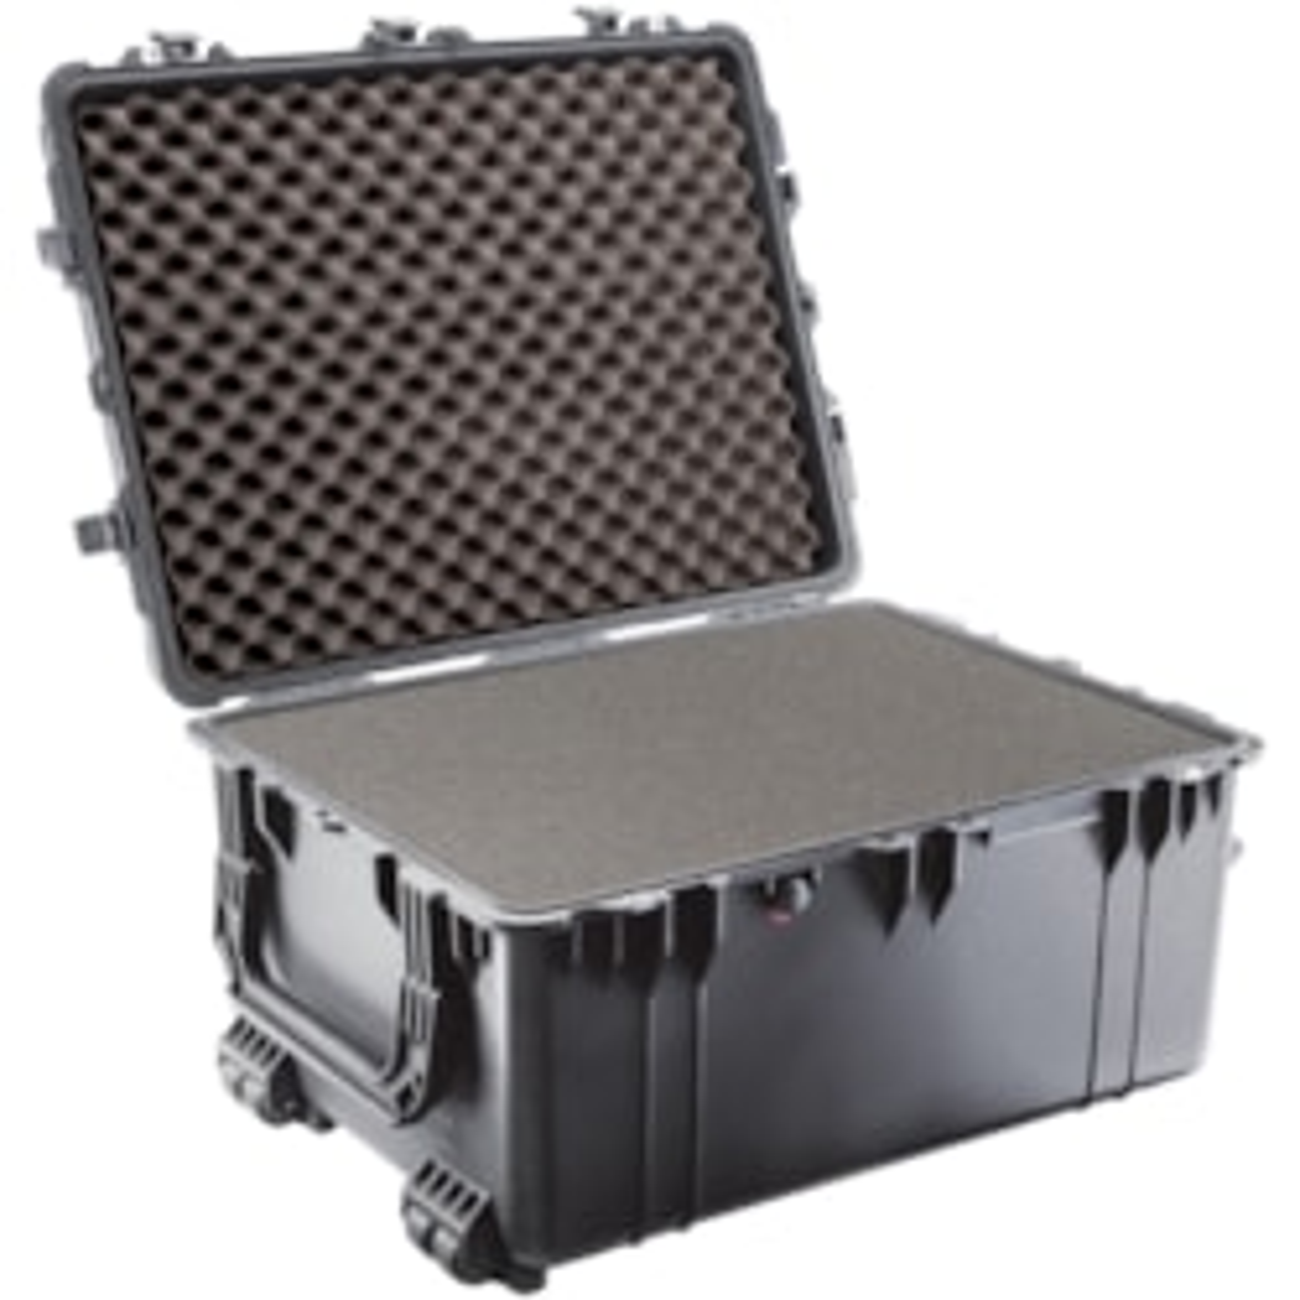 Pelican 1630 Shipping Case (Box) for Multipurpose